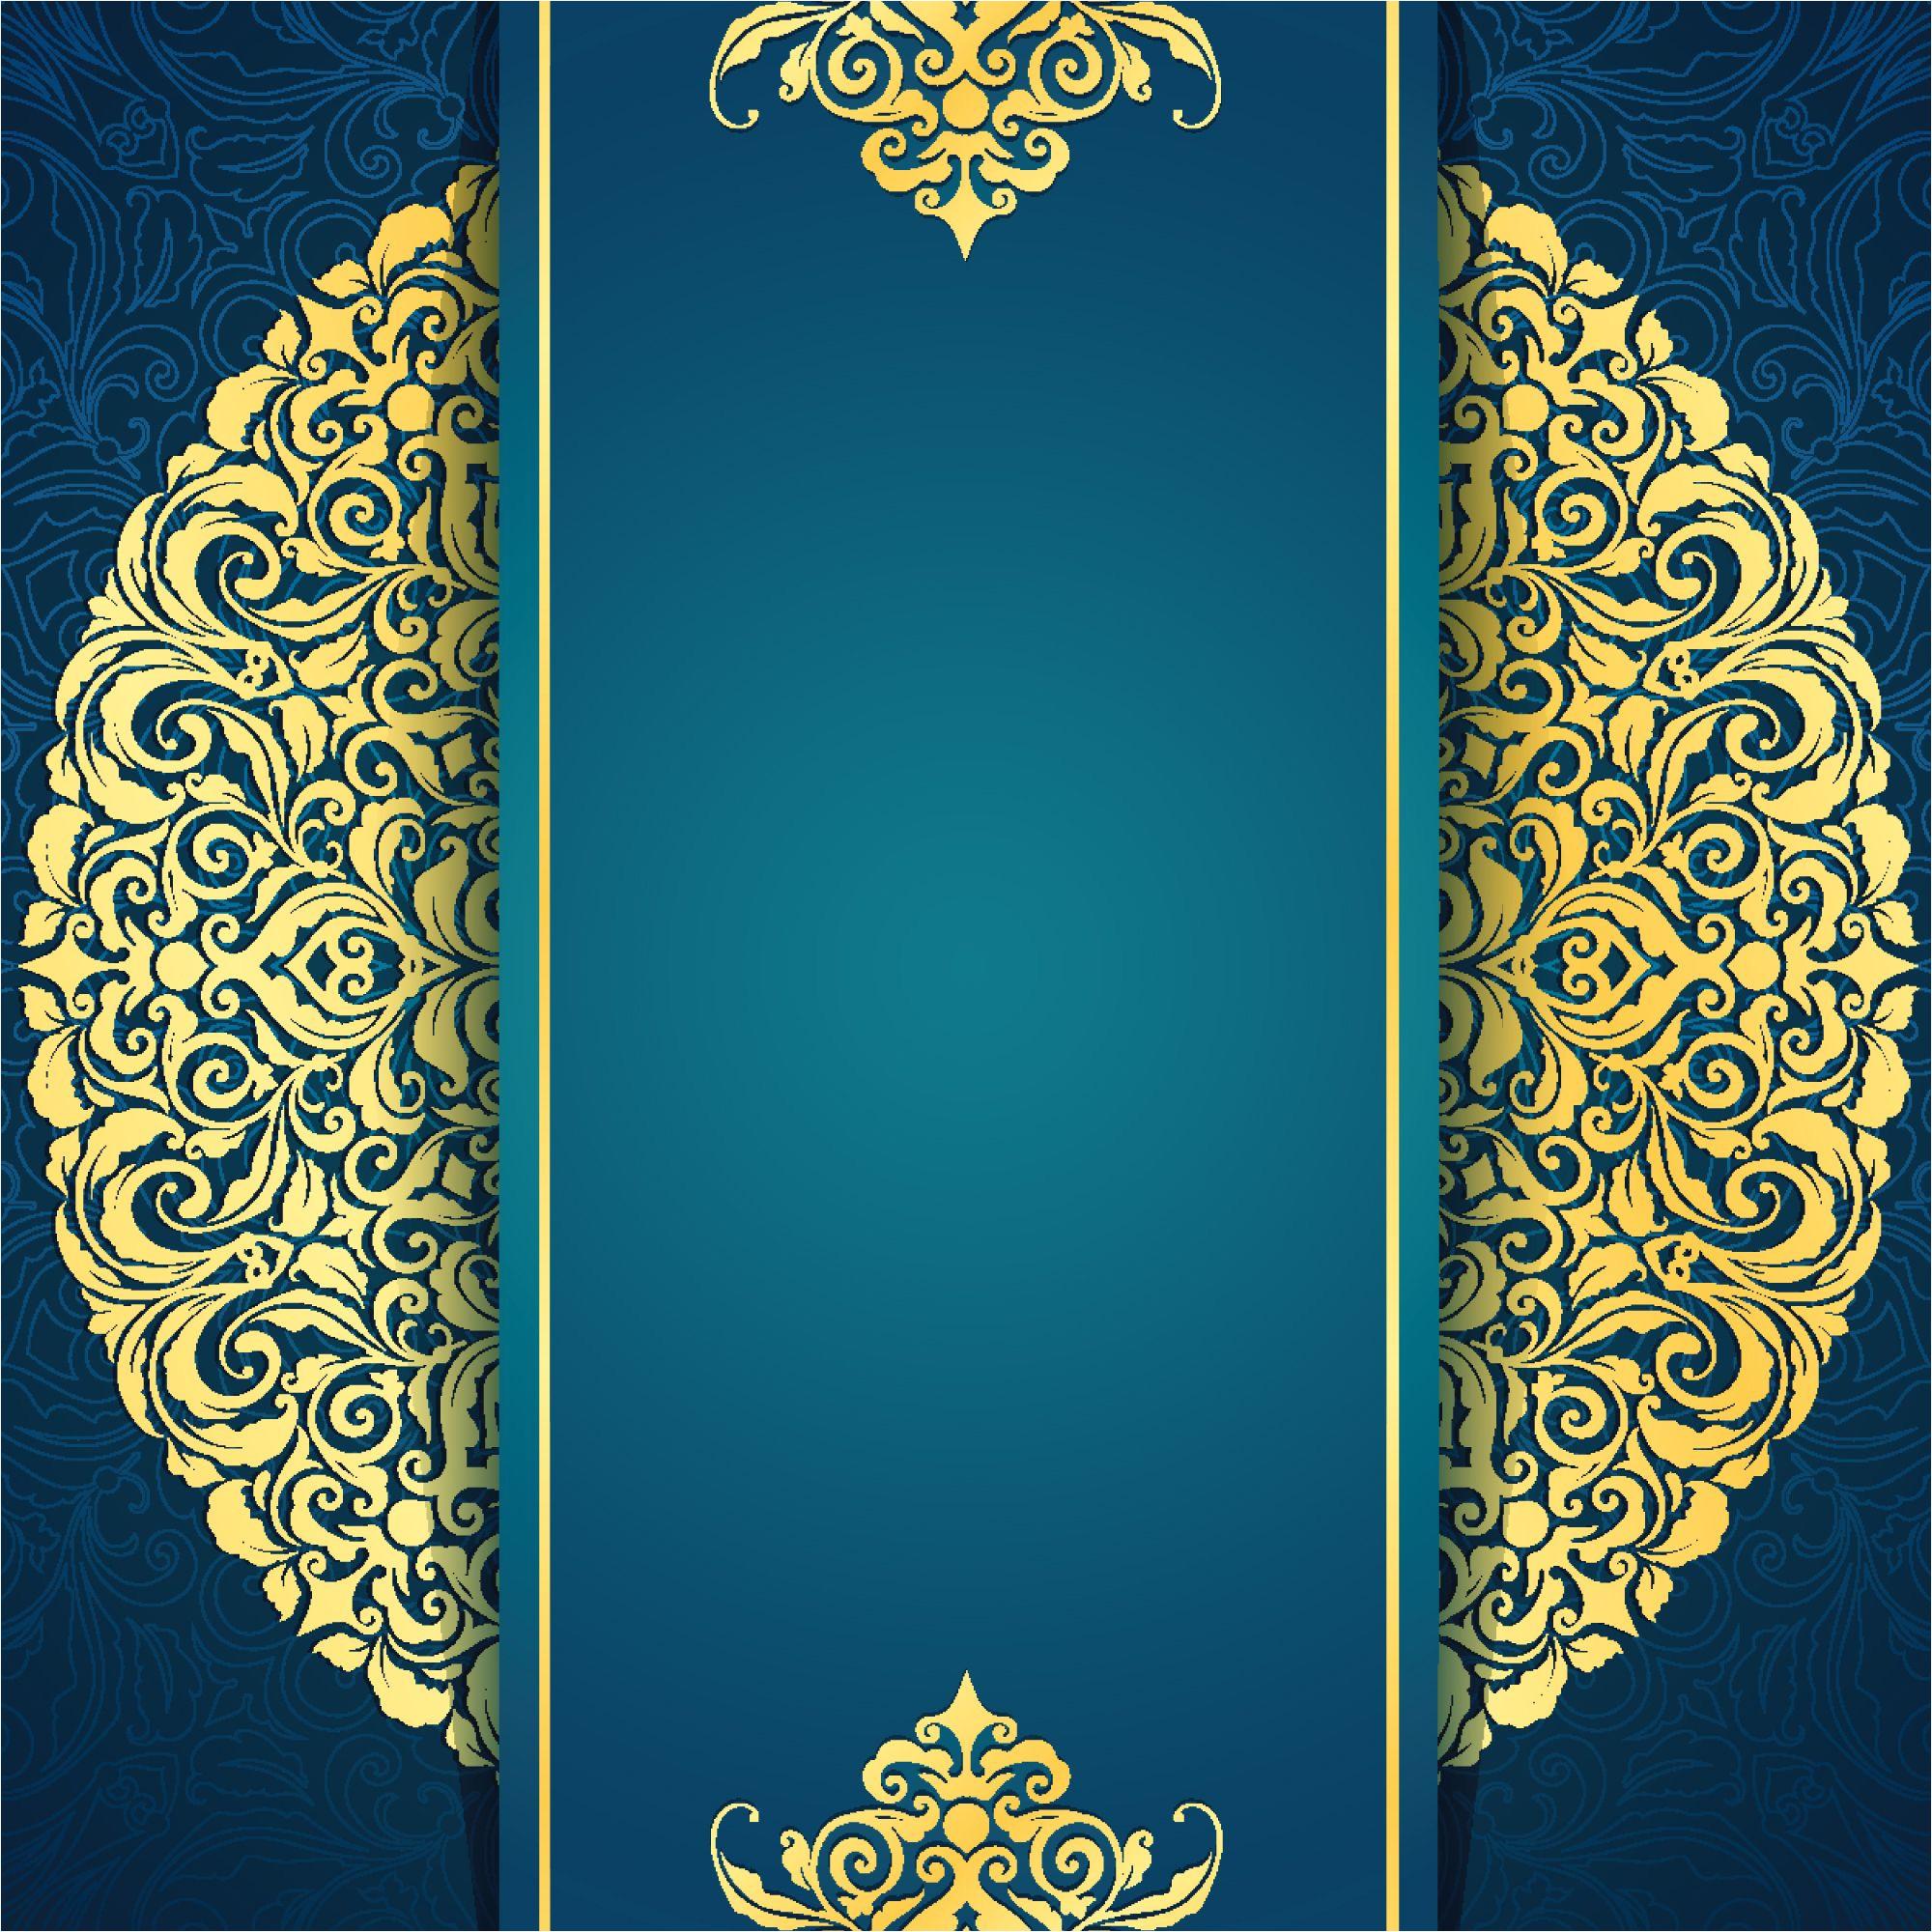 Hindu Wedding Invitation Card Background Design 14 Elegant Invitation Card Background Images Images with